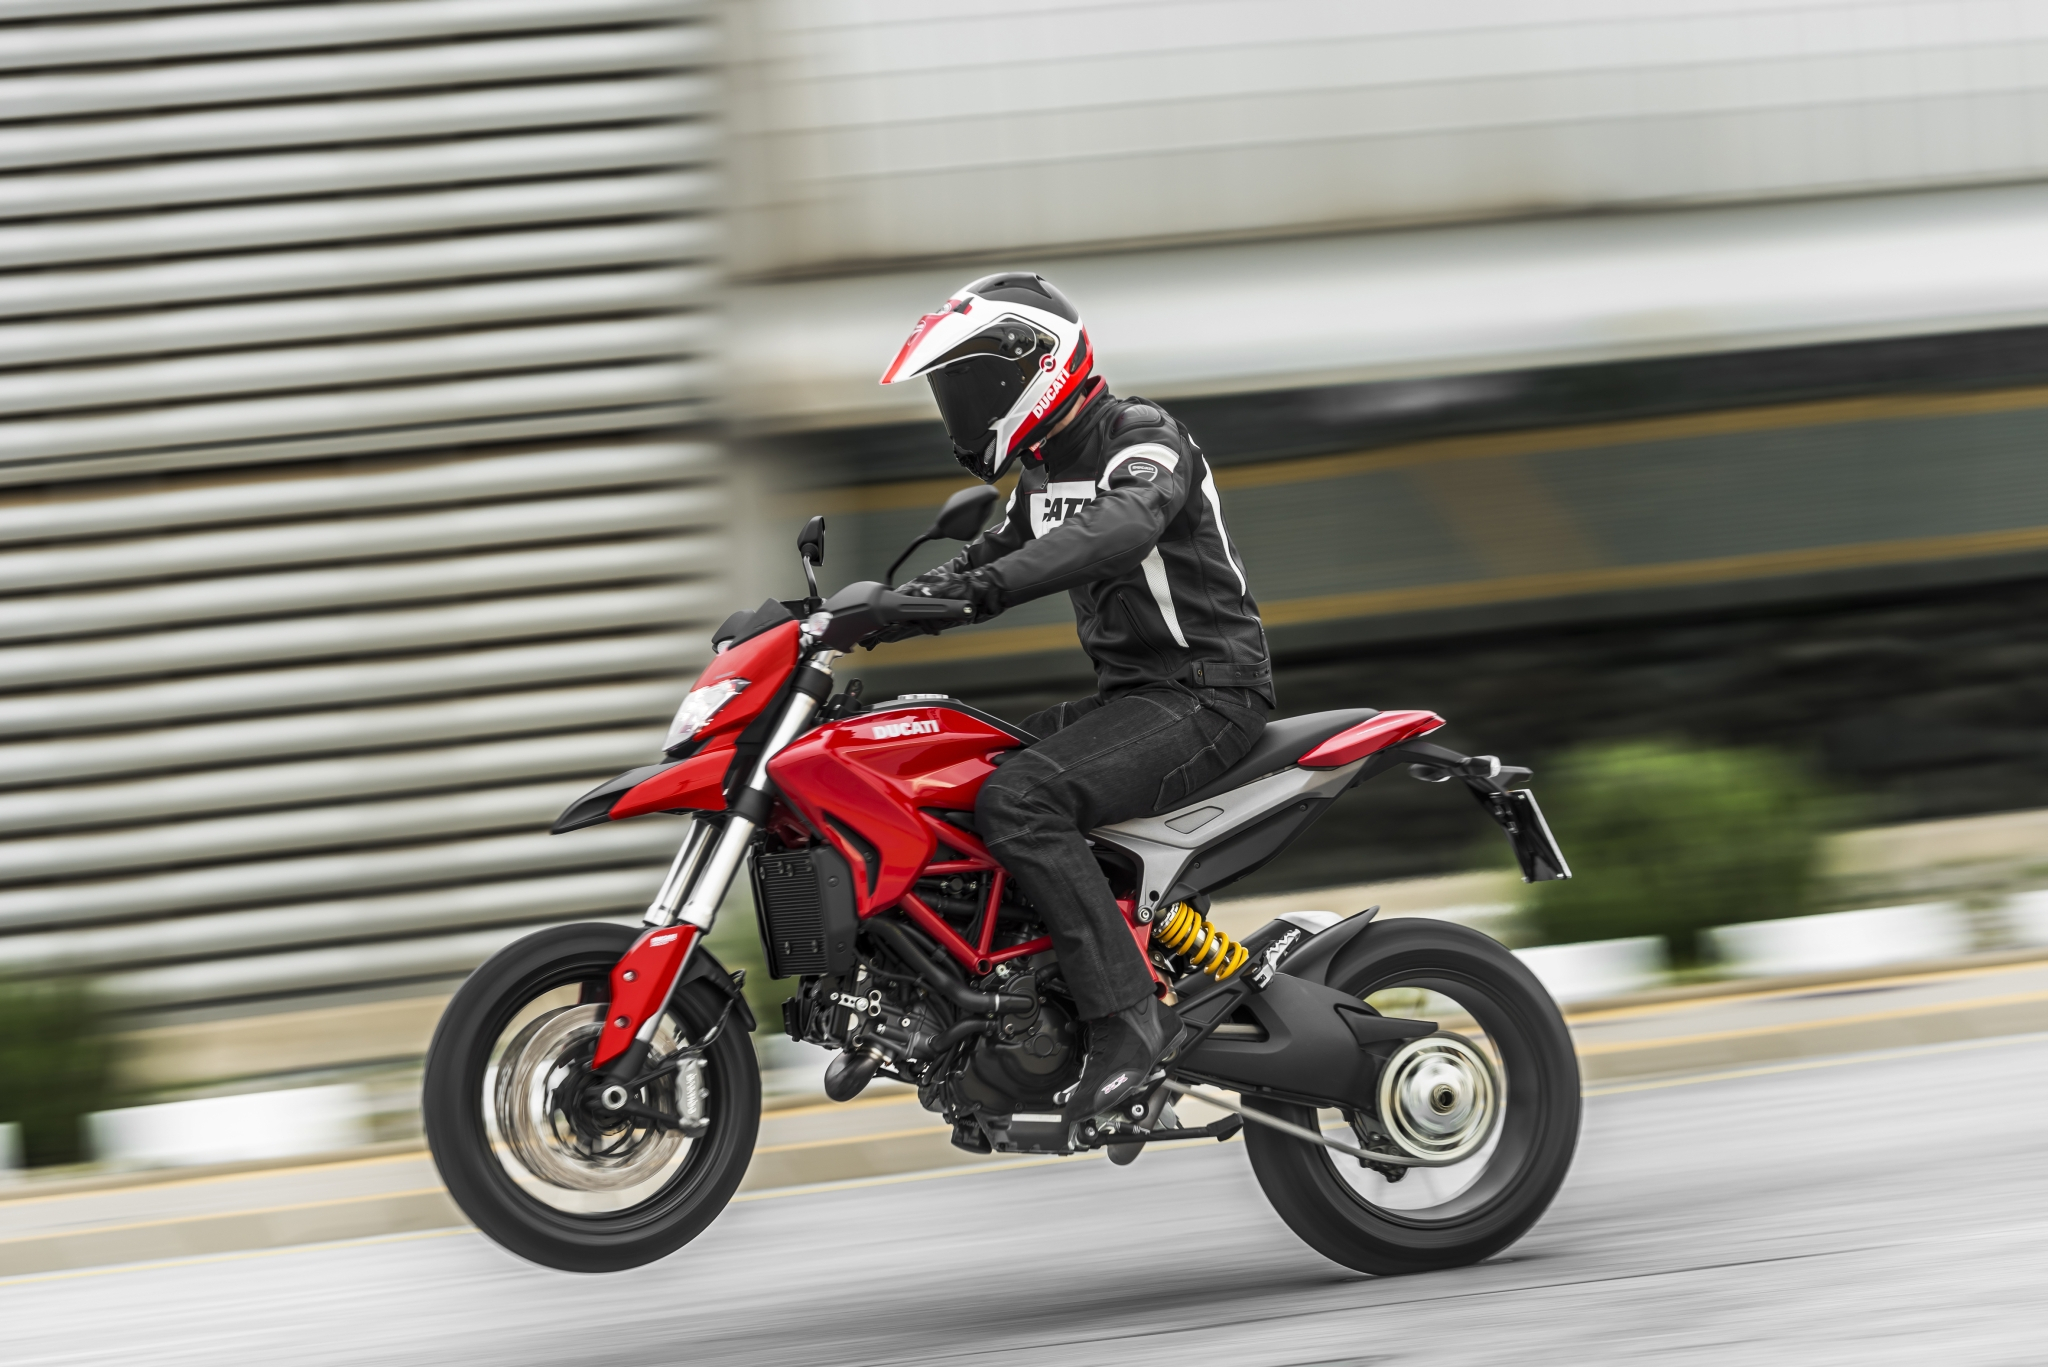 2014 Ducati Hypermotard, License to Thrill - autoevolution